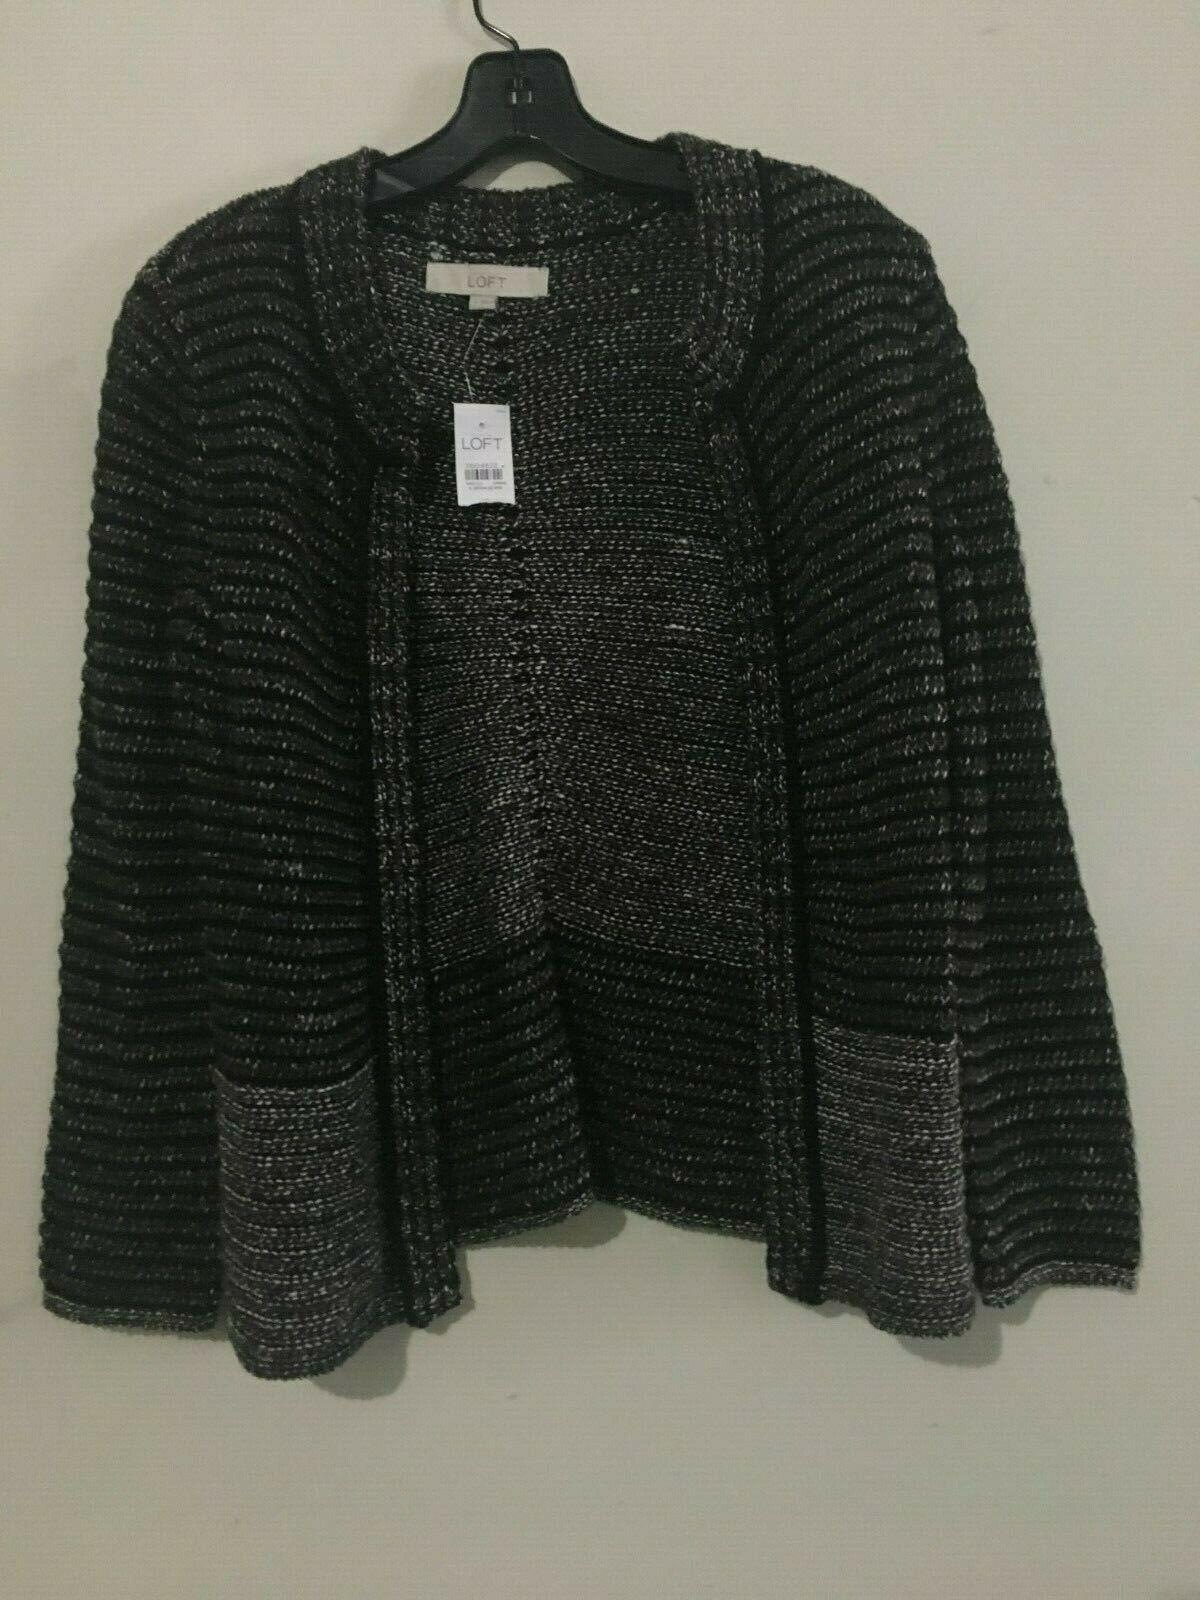 NWT Ann Taylor Loft Tweed Brown Cardigan Size S Sweater Top Women 100% Cotton